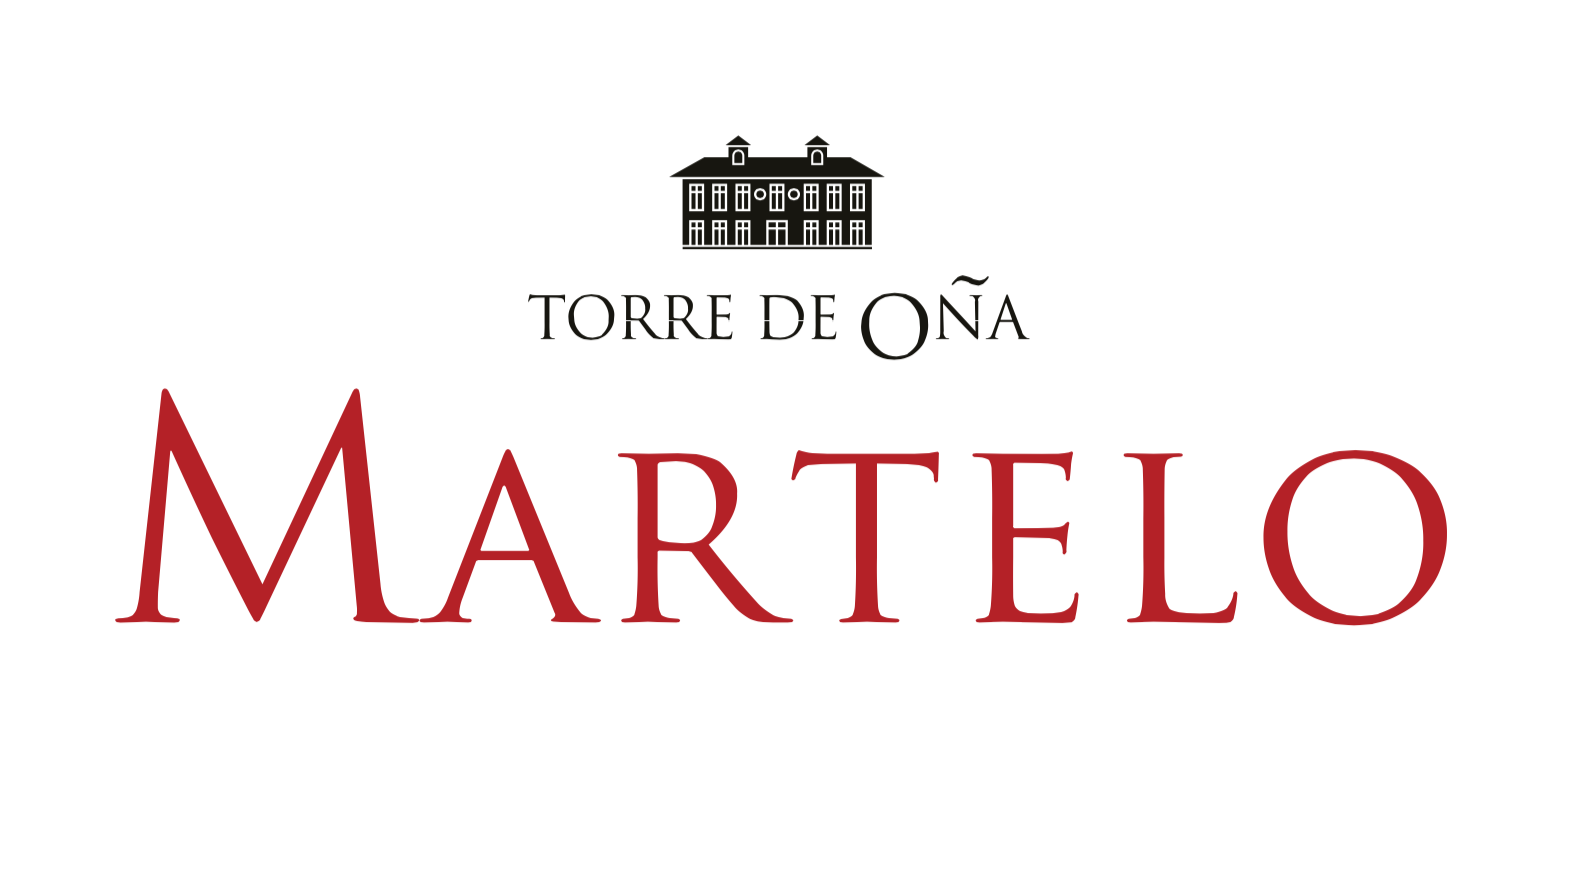 Torre de Oña –Martelo